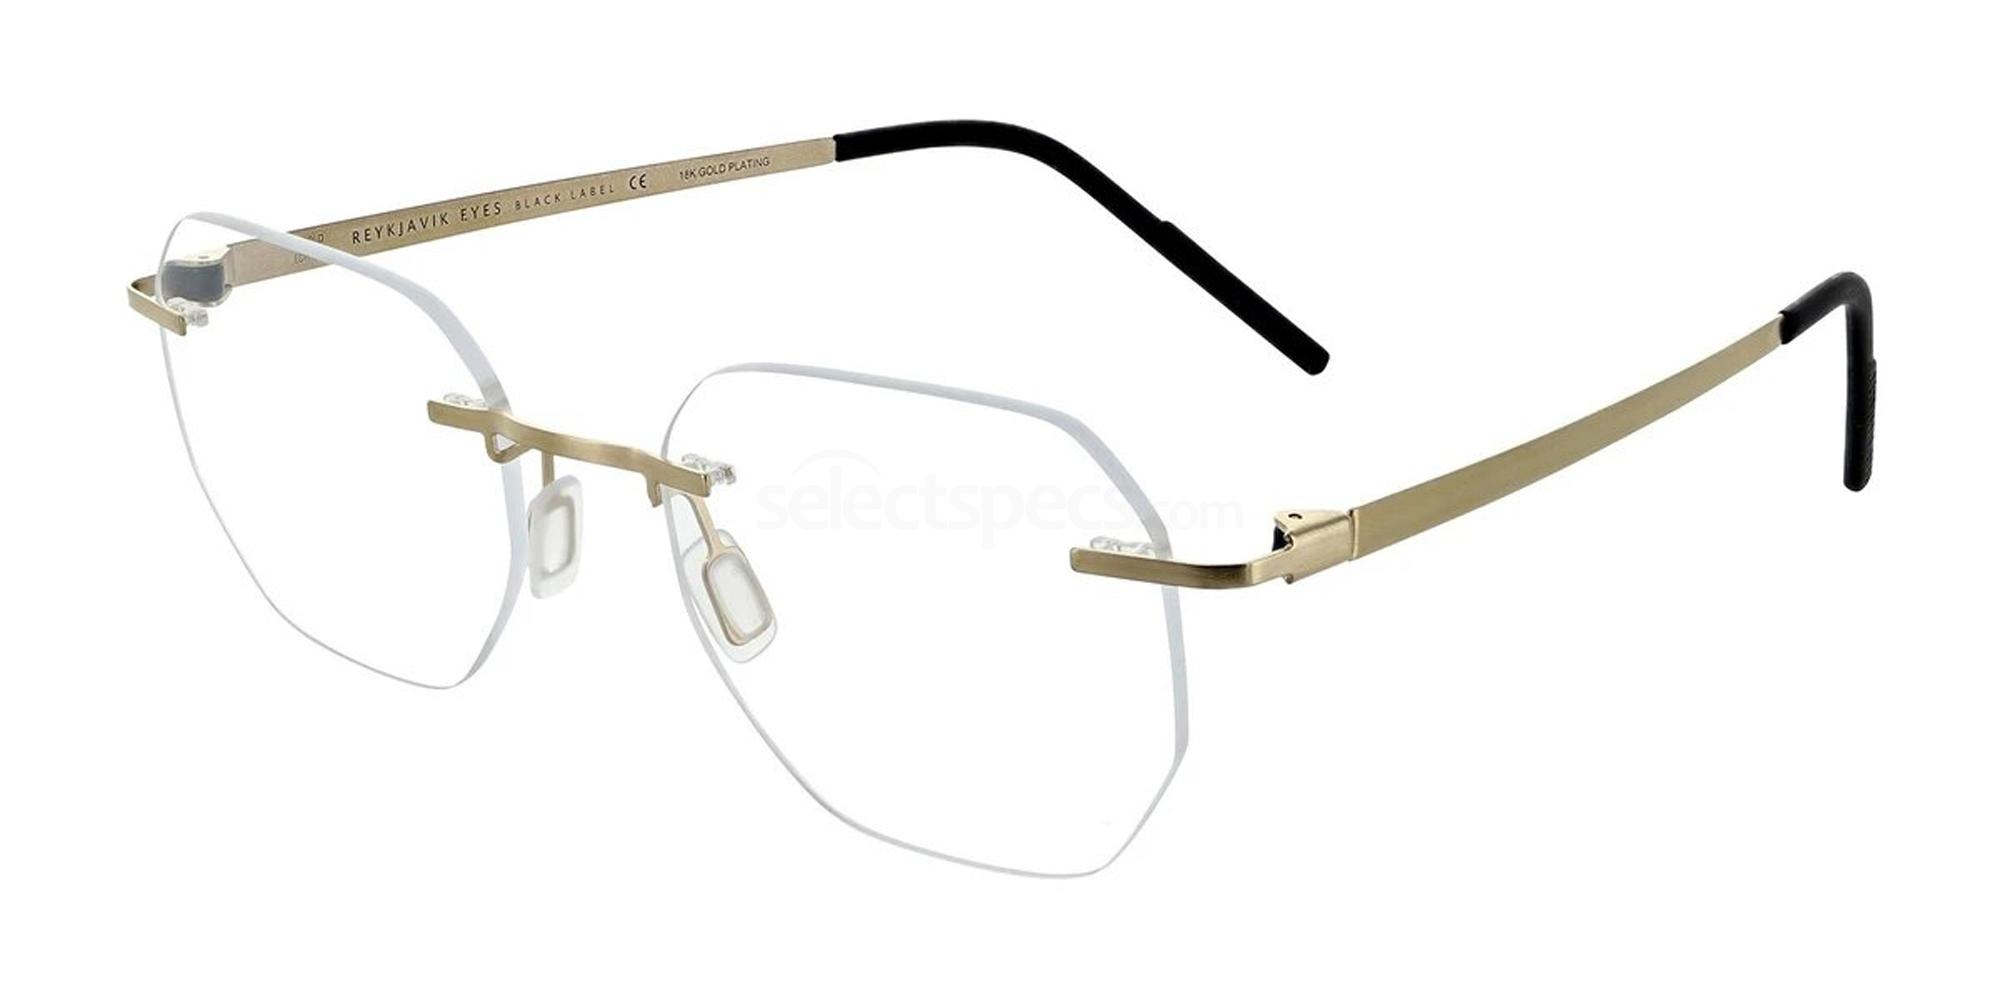 18K GOLD HENGILL GOLD EDITION Glasses, Reykjavik Eyes Black Label